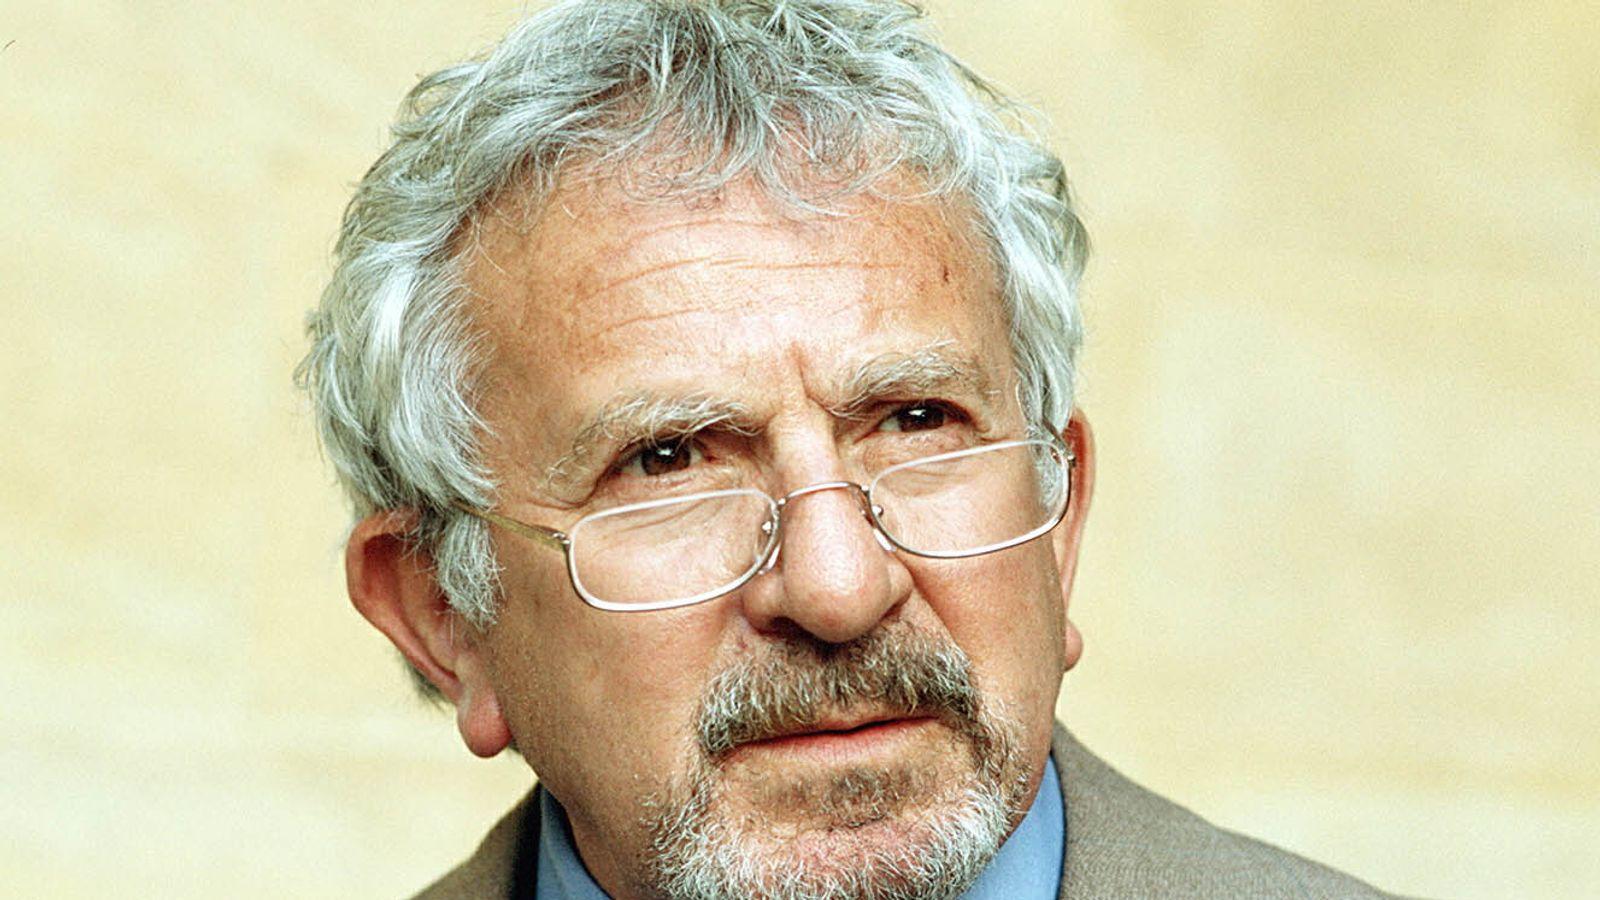 Vicar of Dibley actor John Bluthal dies aged 89